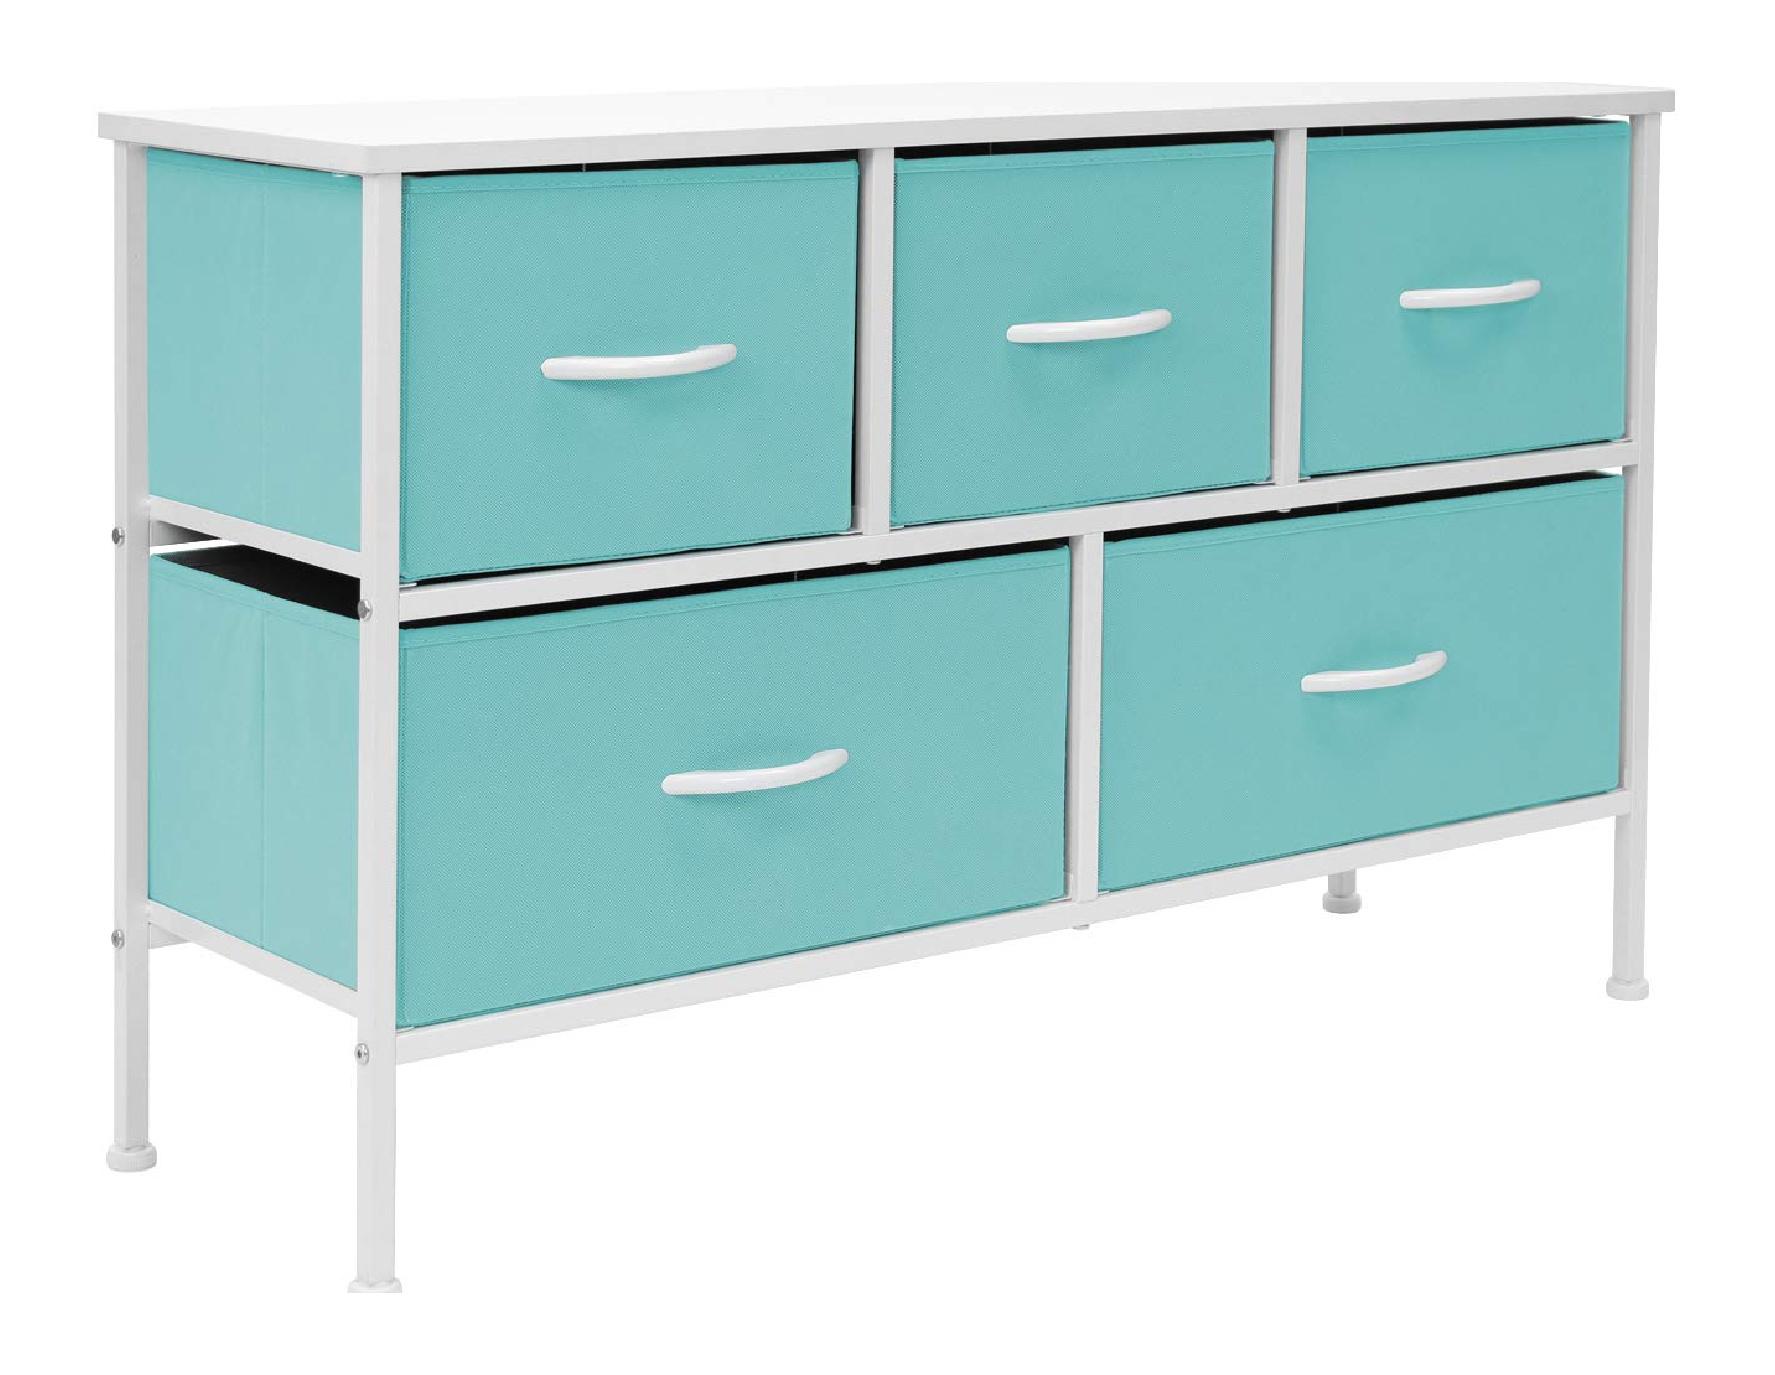 Storage dresser with fabric bins